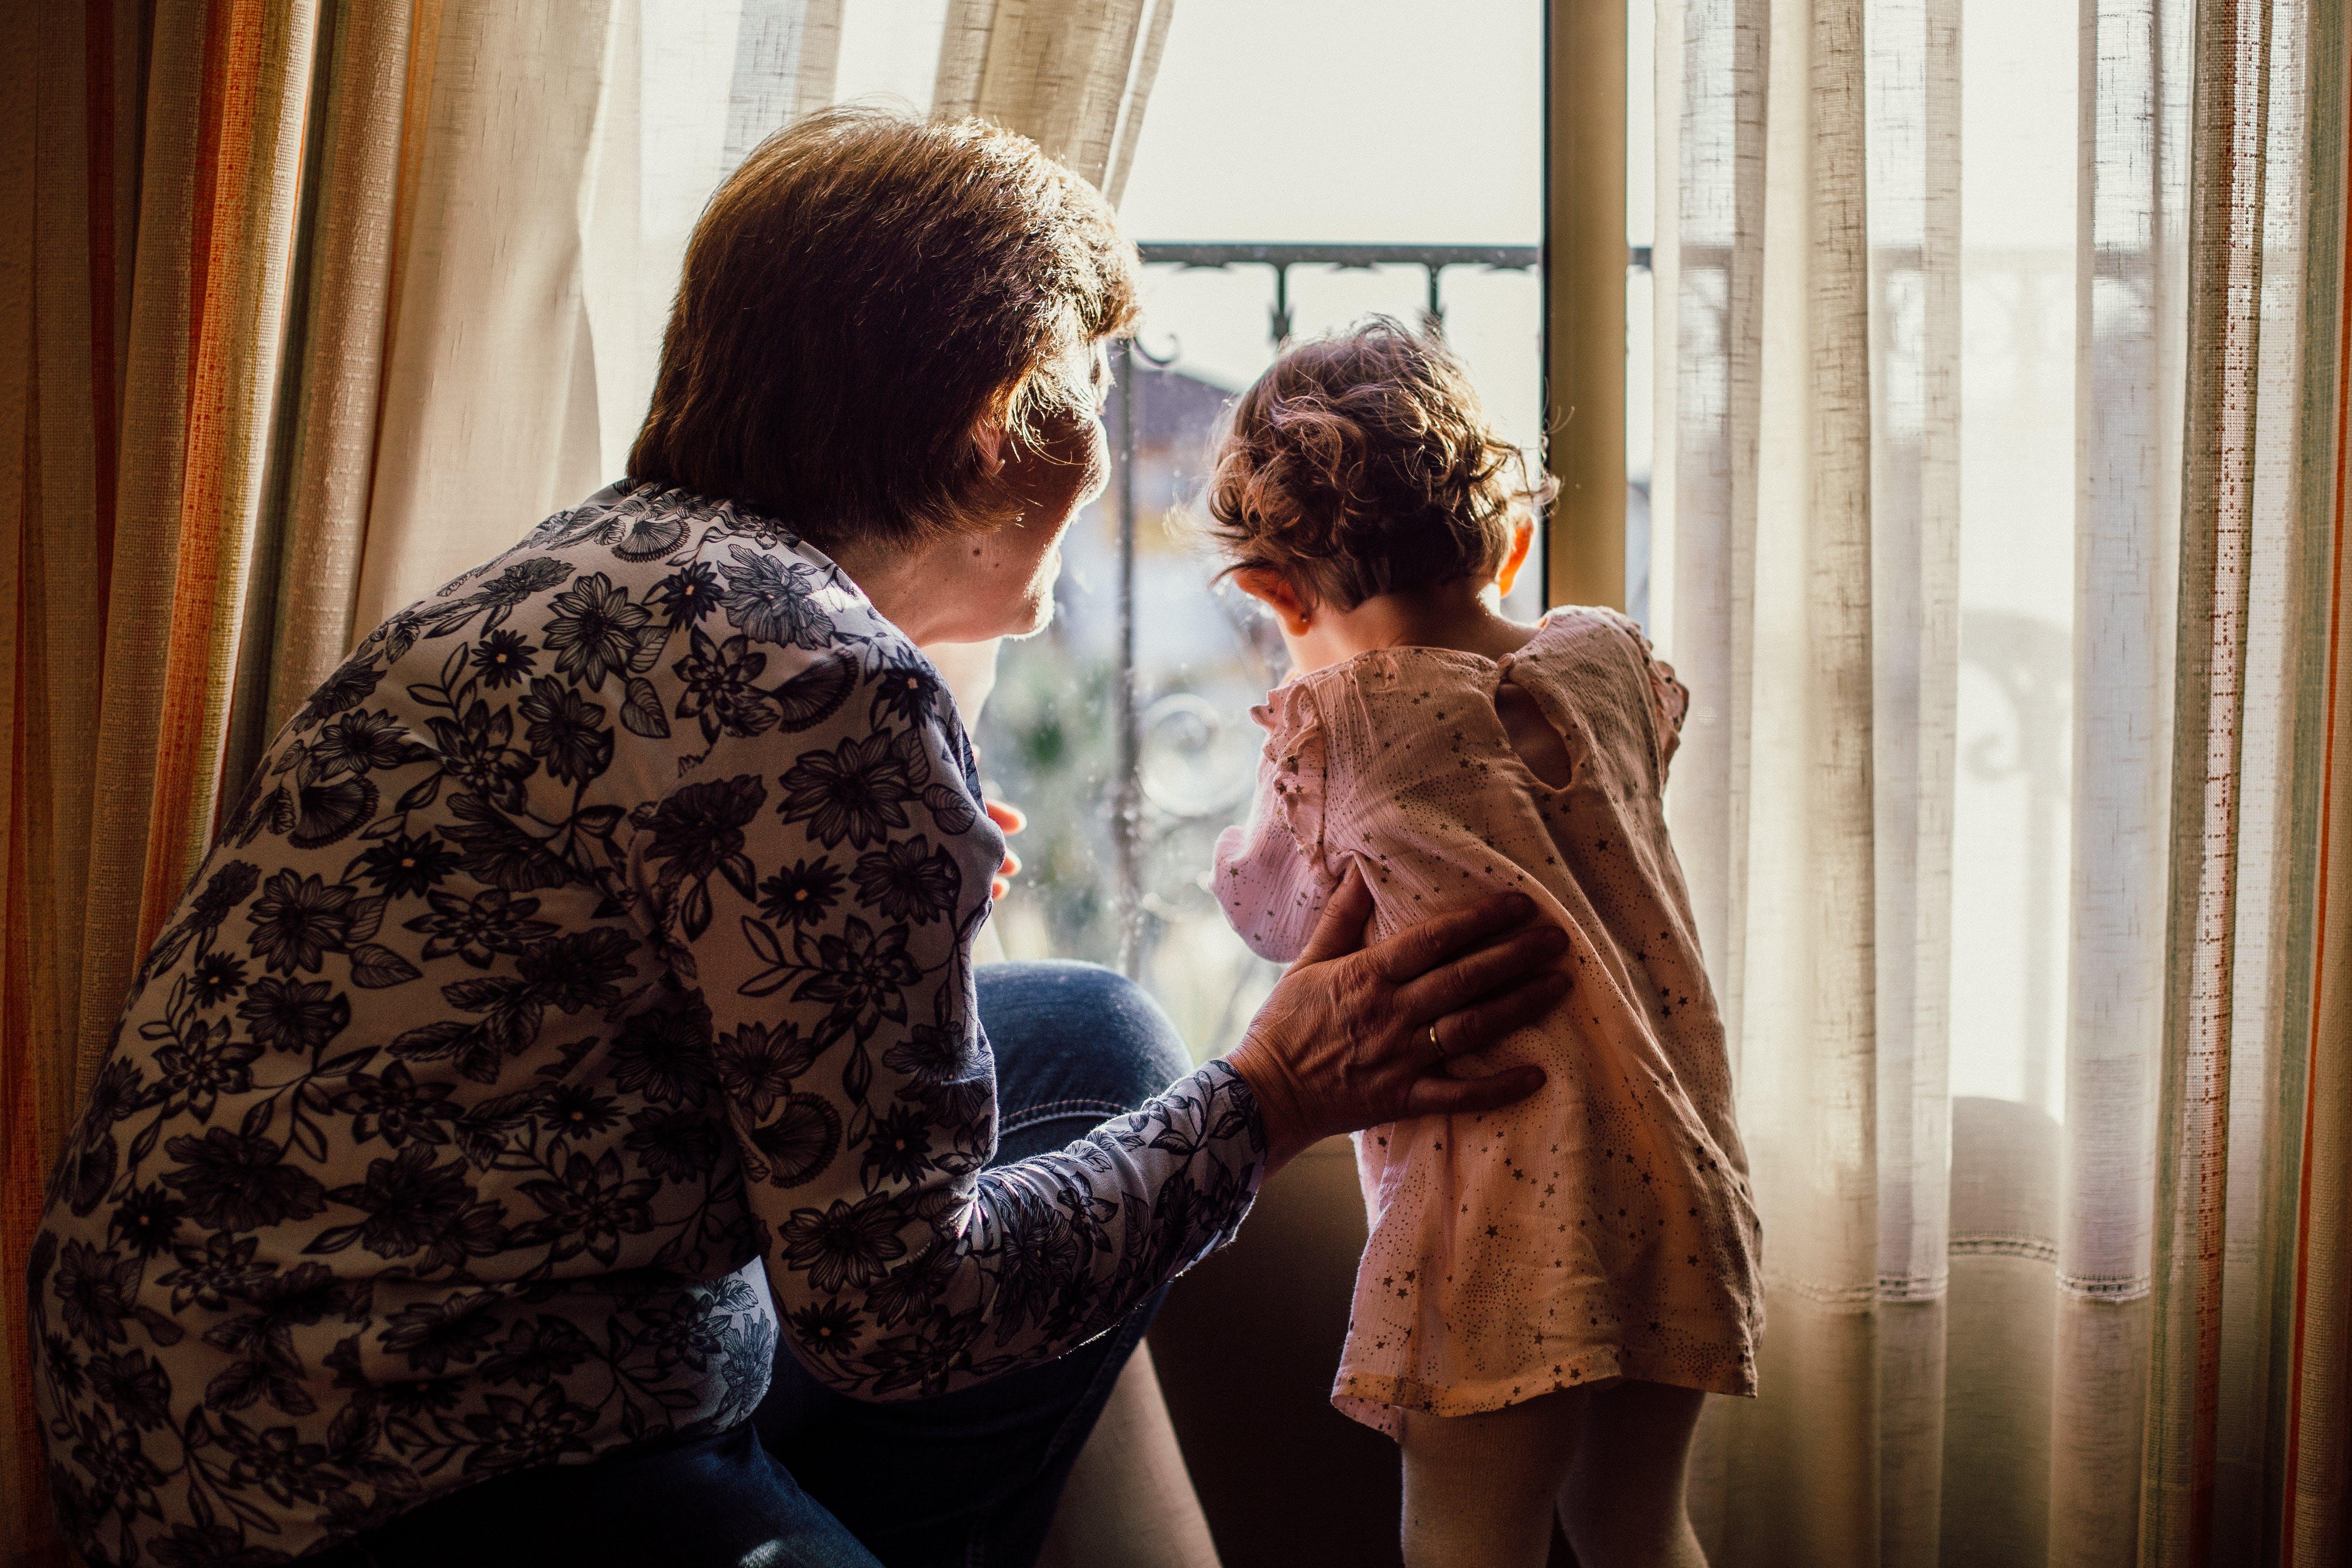 Woman Holding Baby Near Window